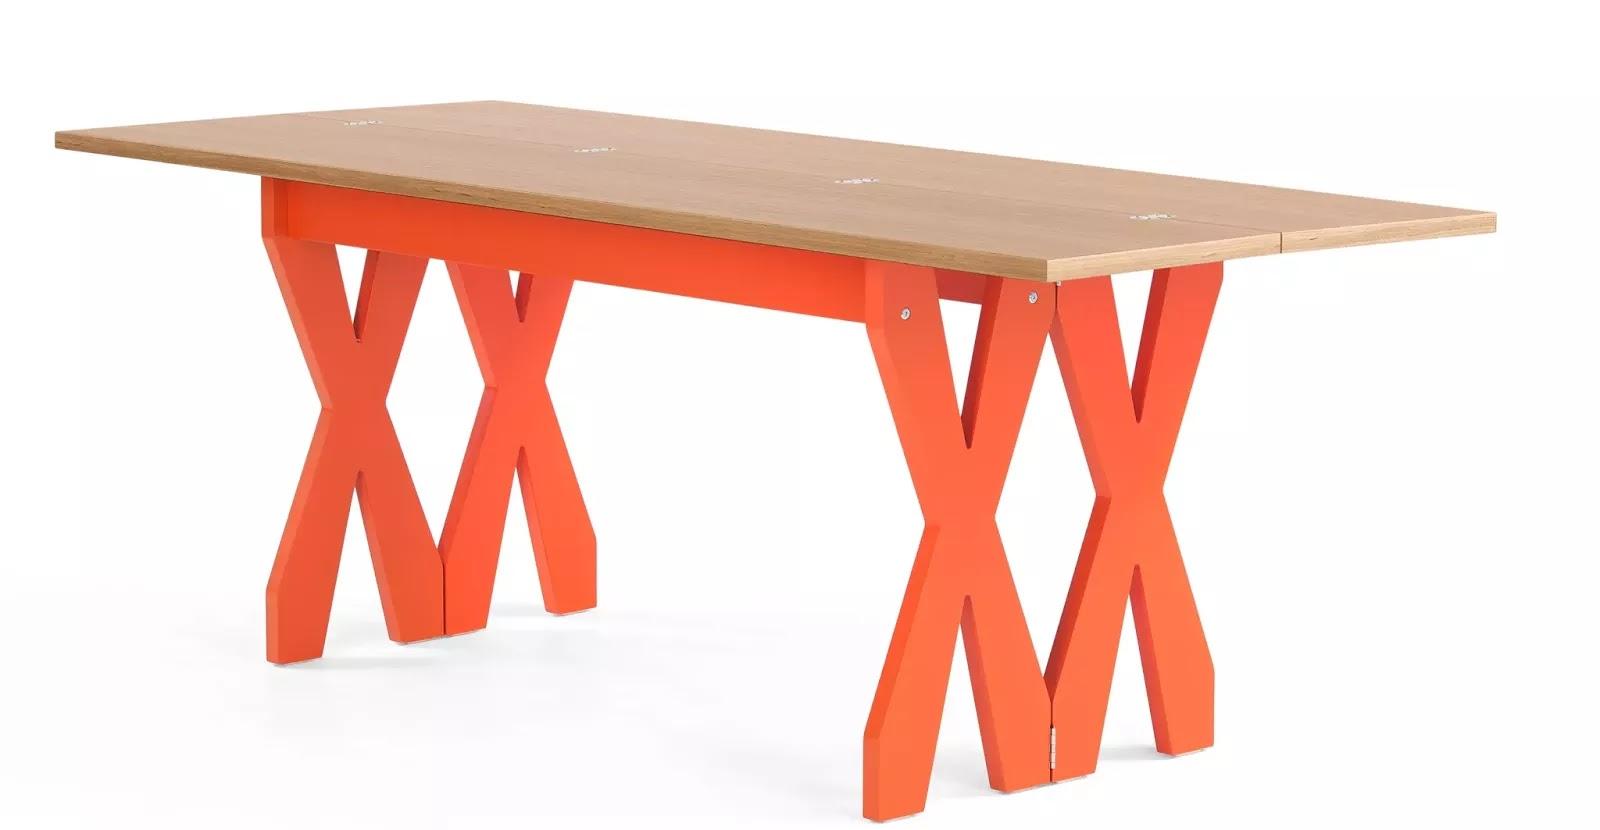 Marks And Spencer Dining Room Furniture Marks And Spencer Dining Table Furnitures Online Usa